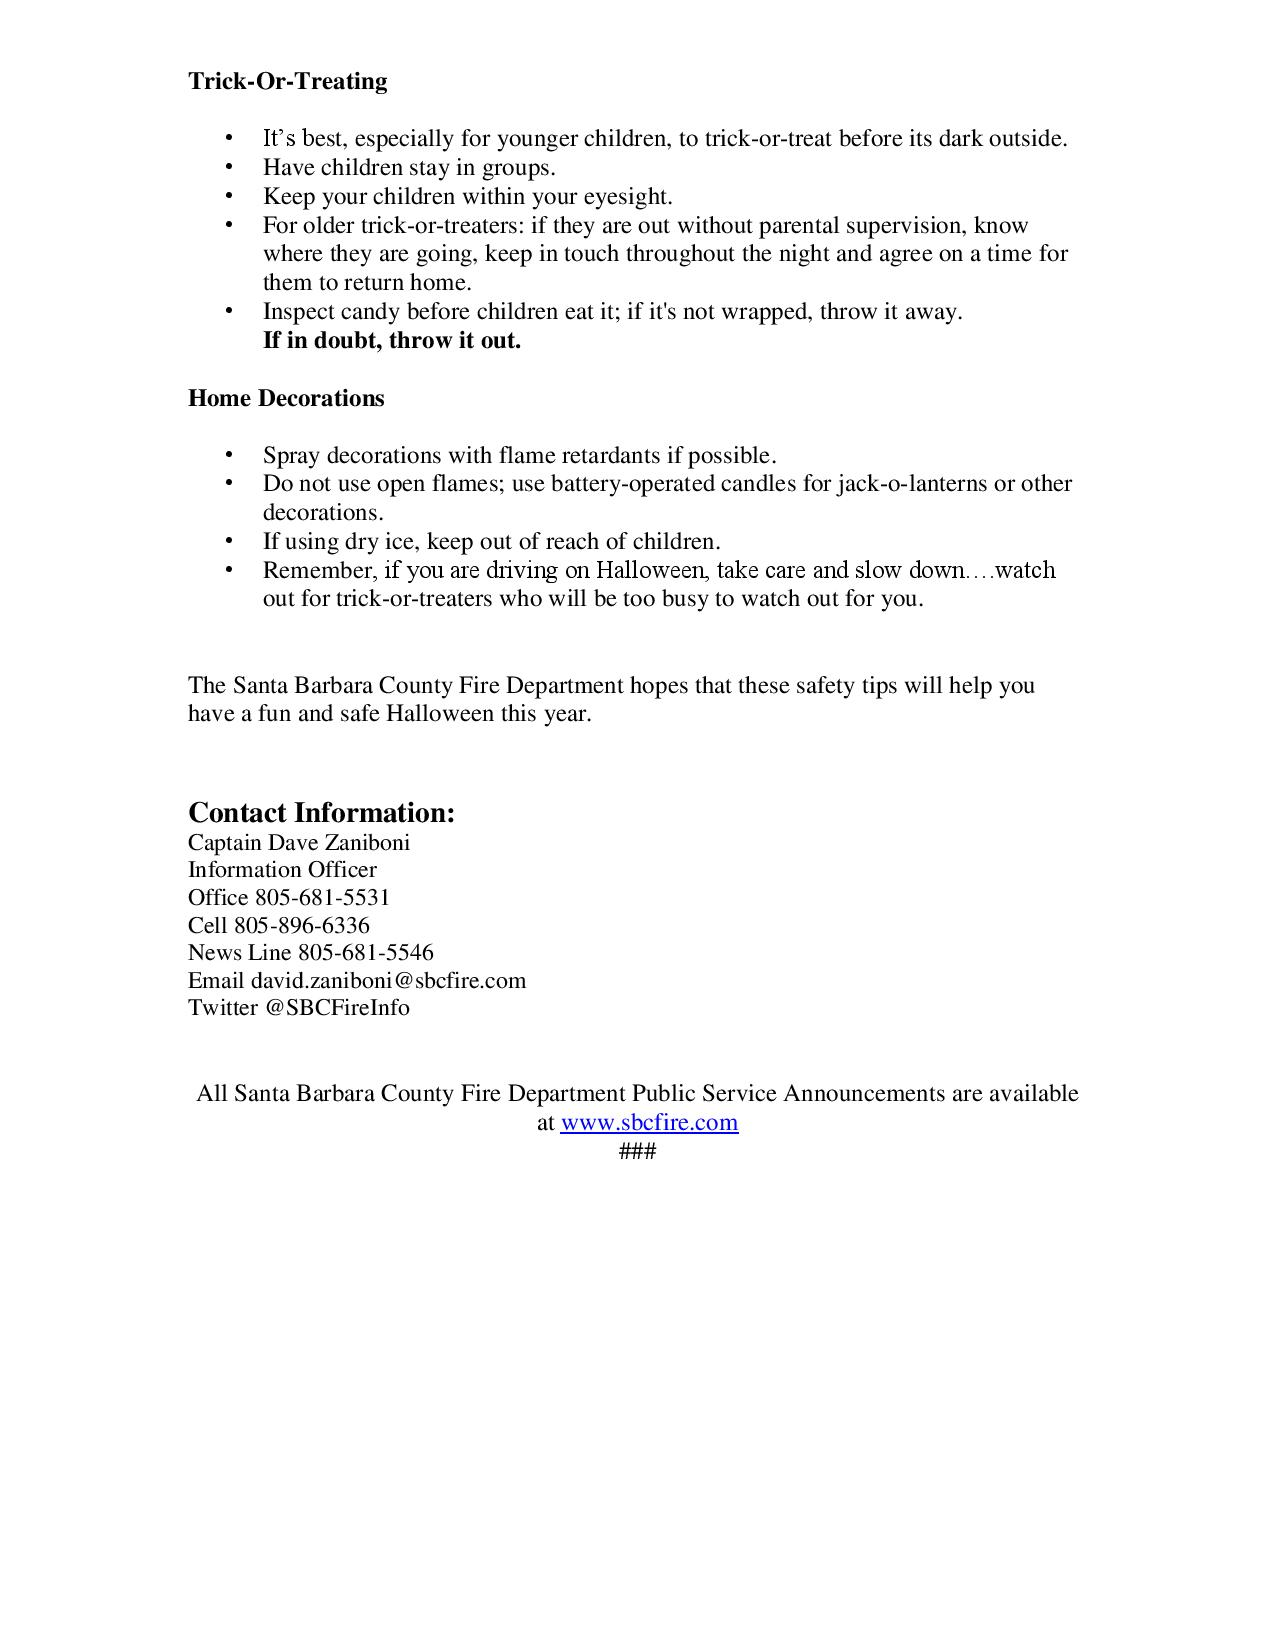 PSA Halloween Safety-pg2